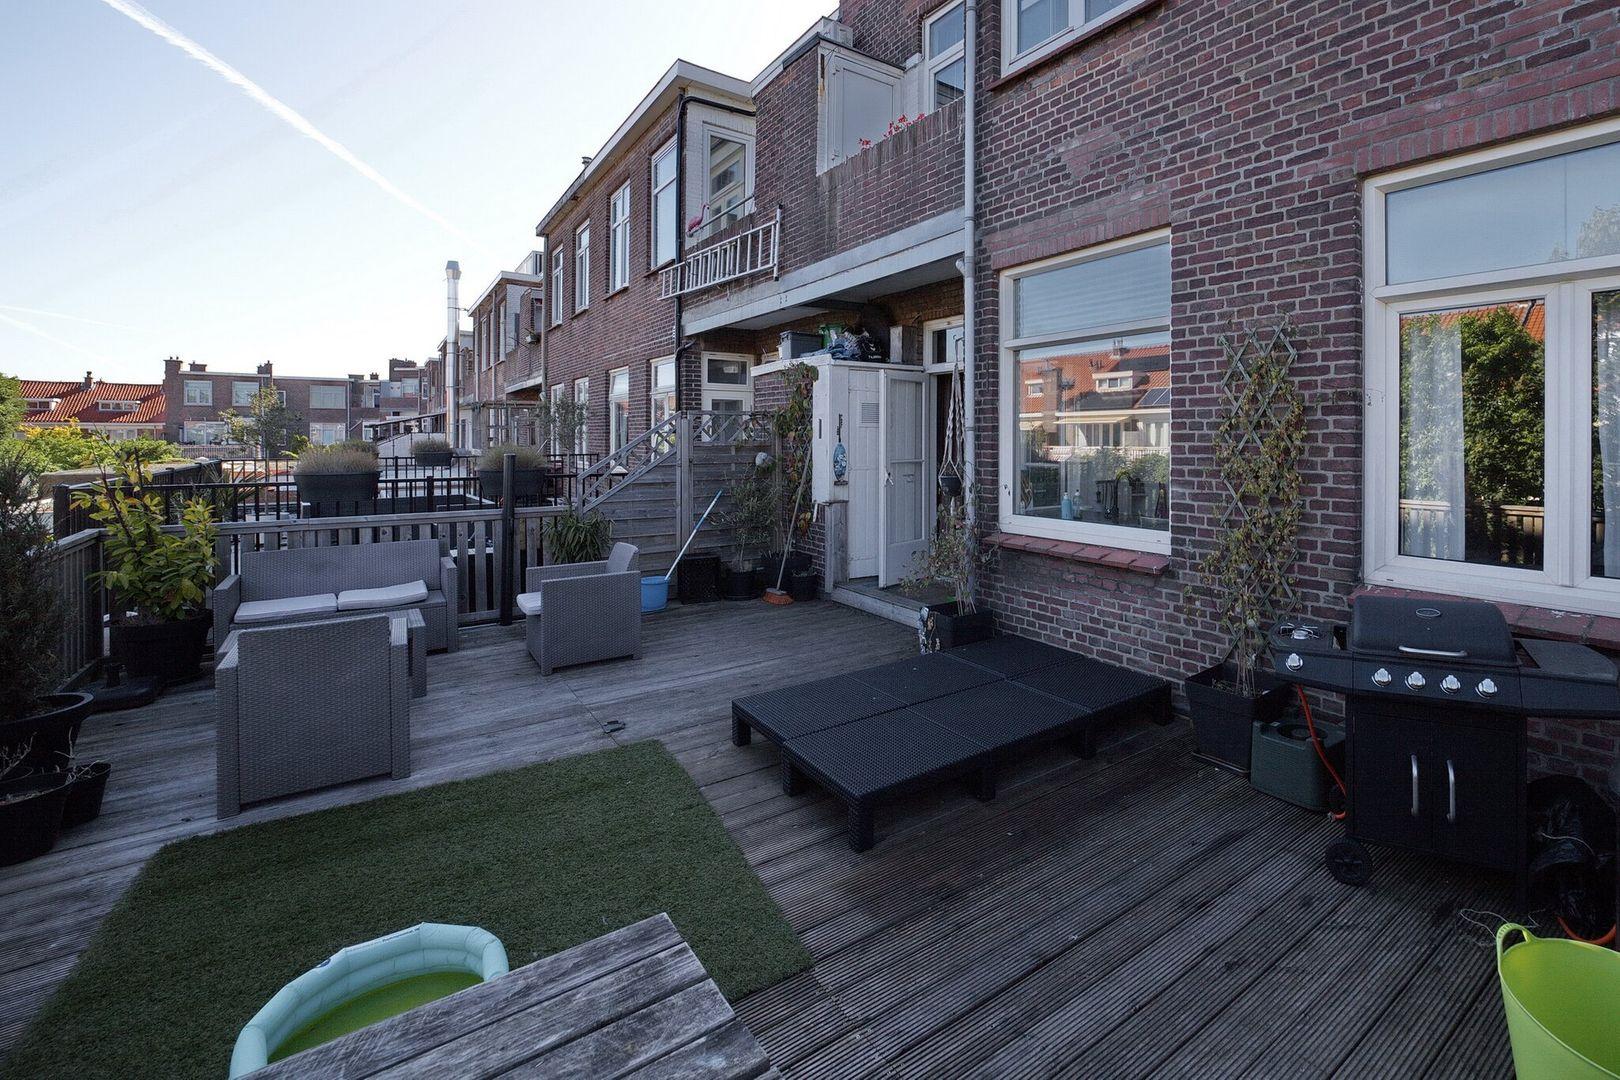 Vlierboomstraat 475, Den Haag foto-9 blur